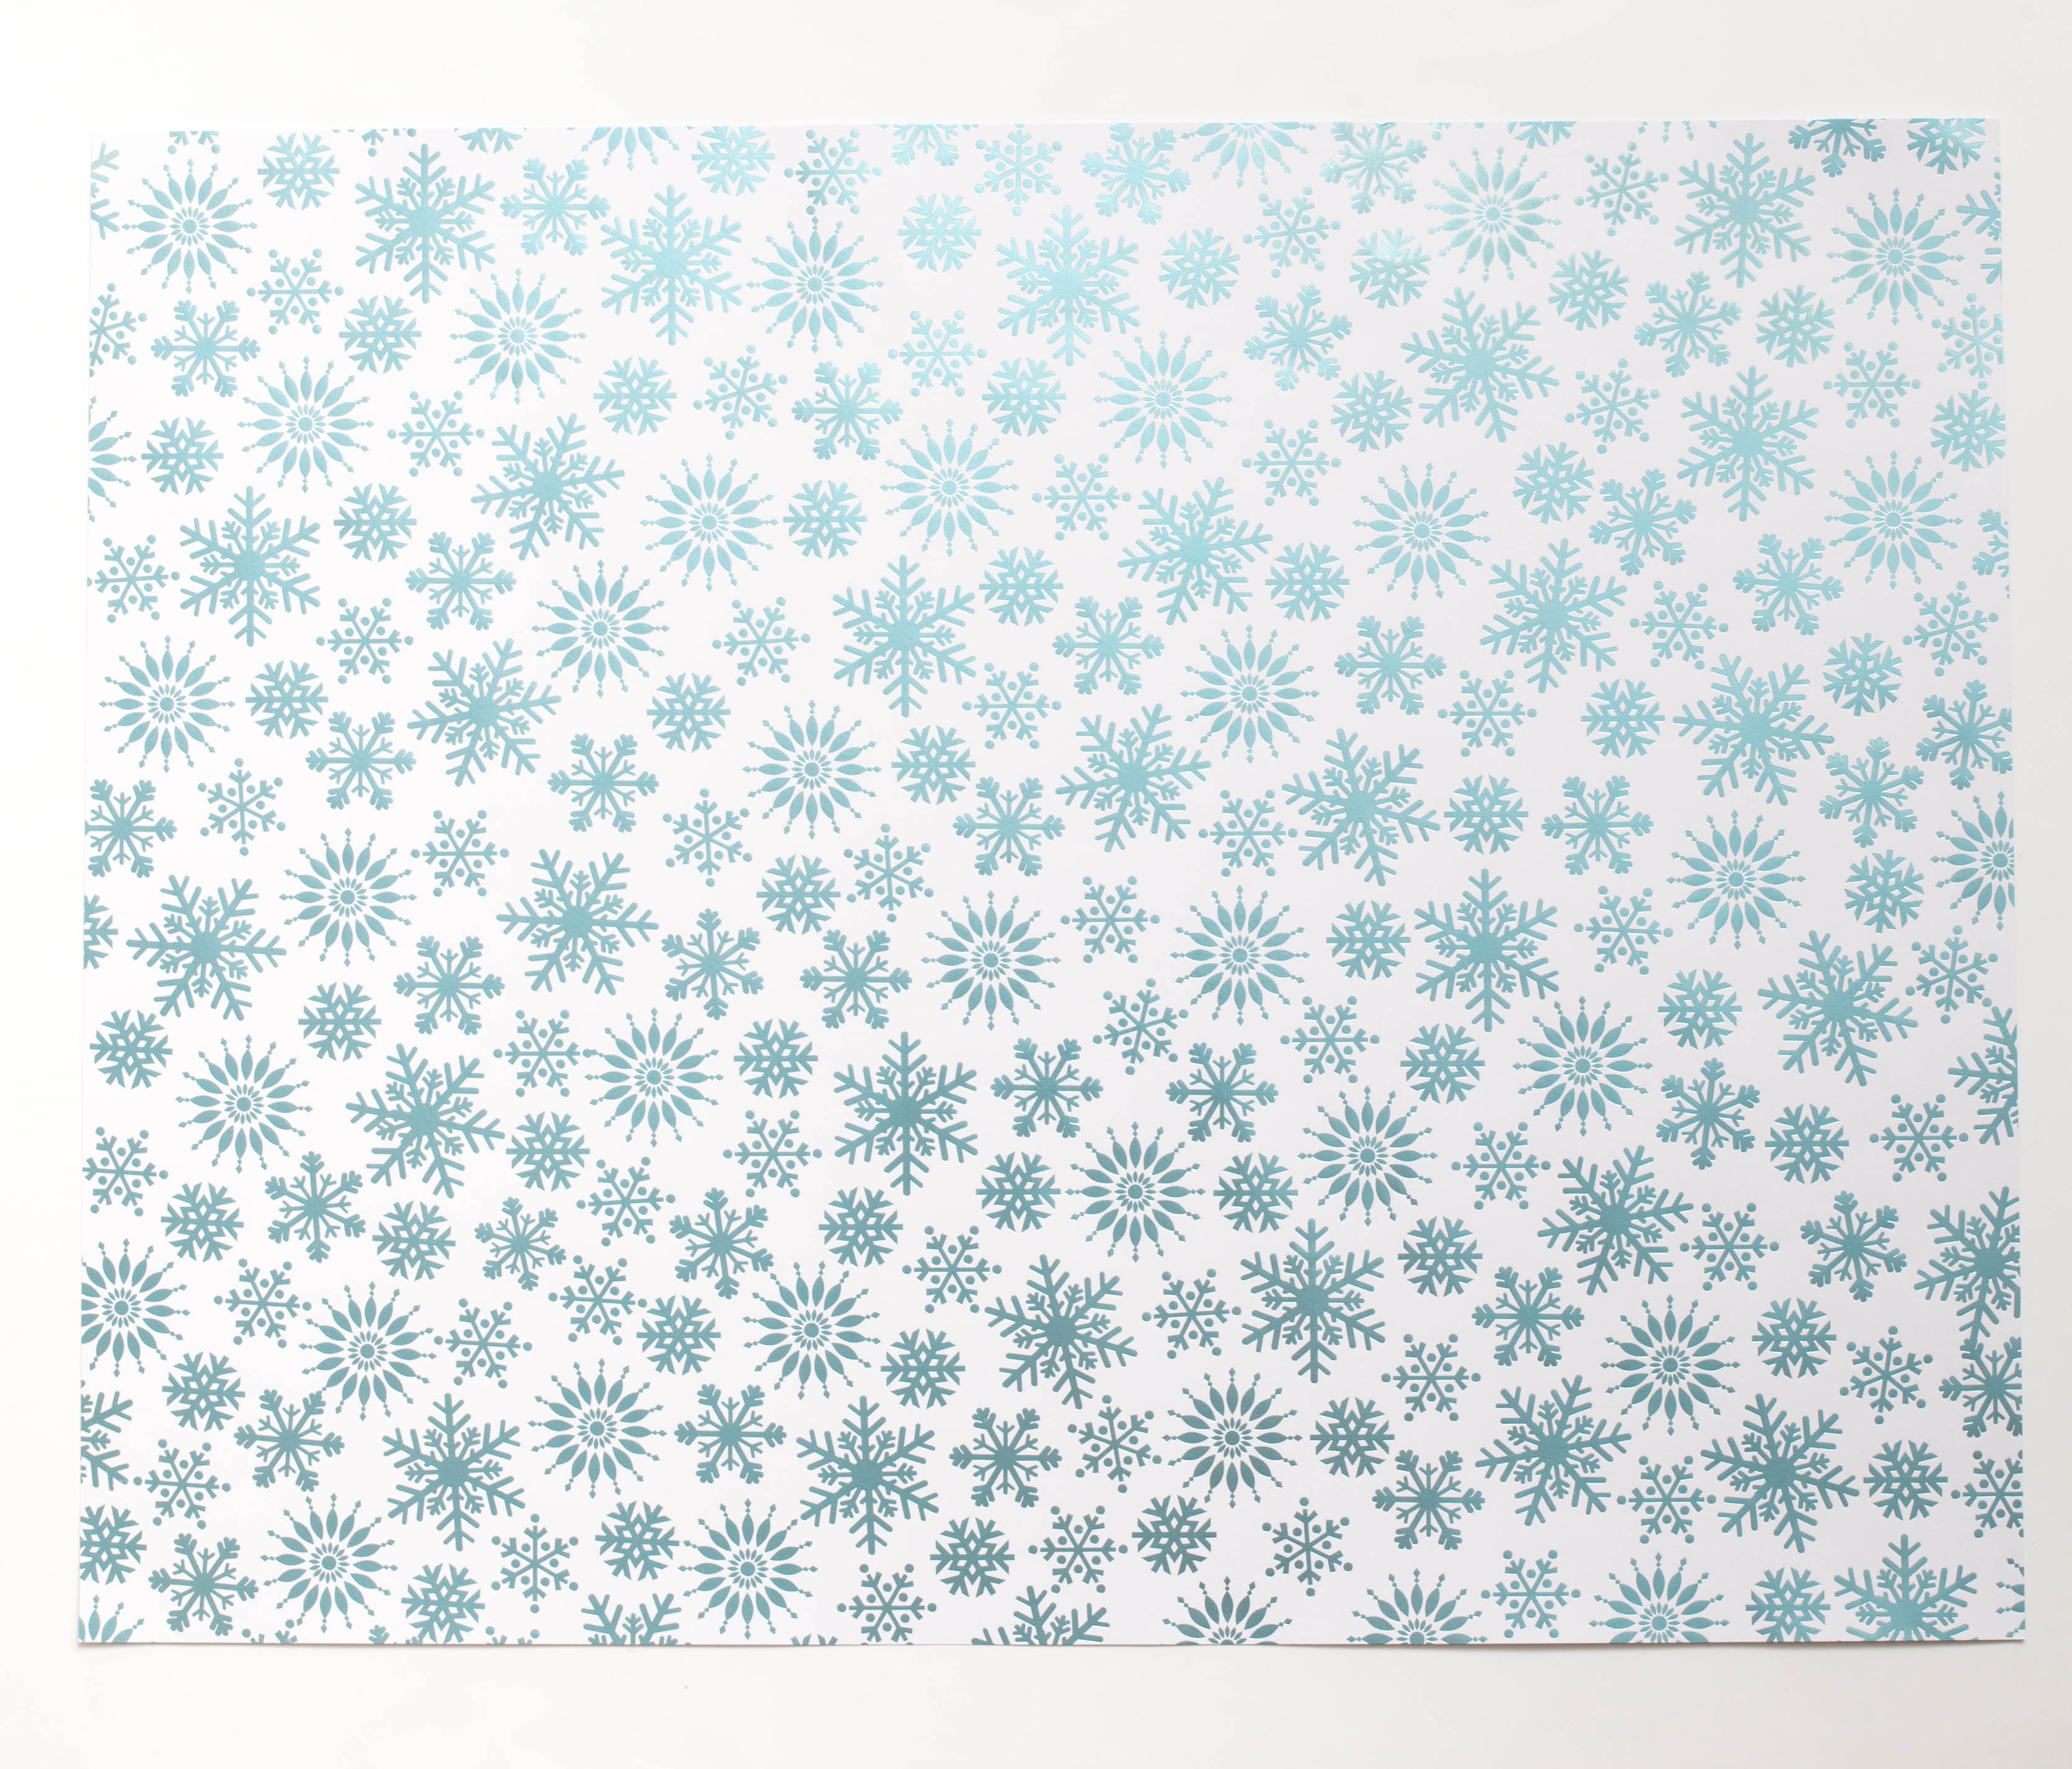 Designer Poster Board - Snowflake